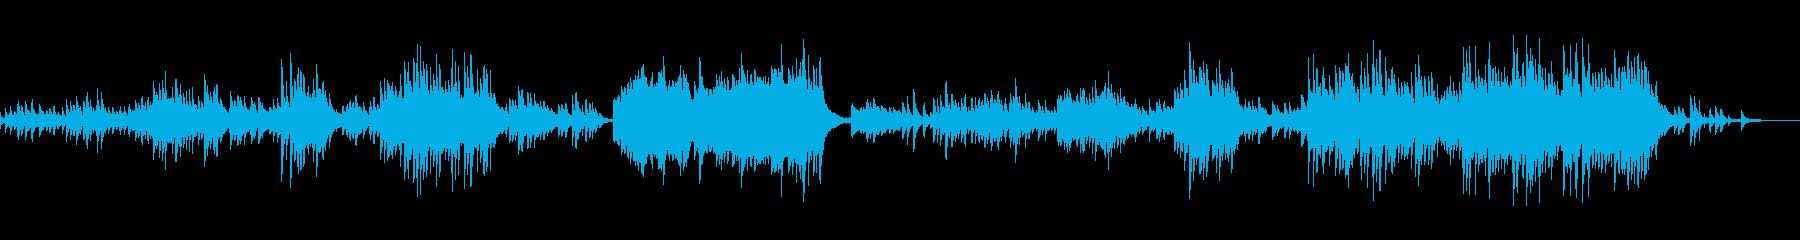 C=528Hz 癒しのピアノ ゆったりの再生済みの波形